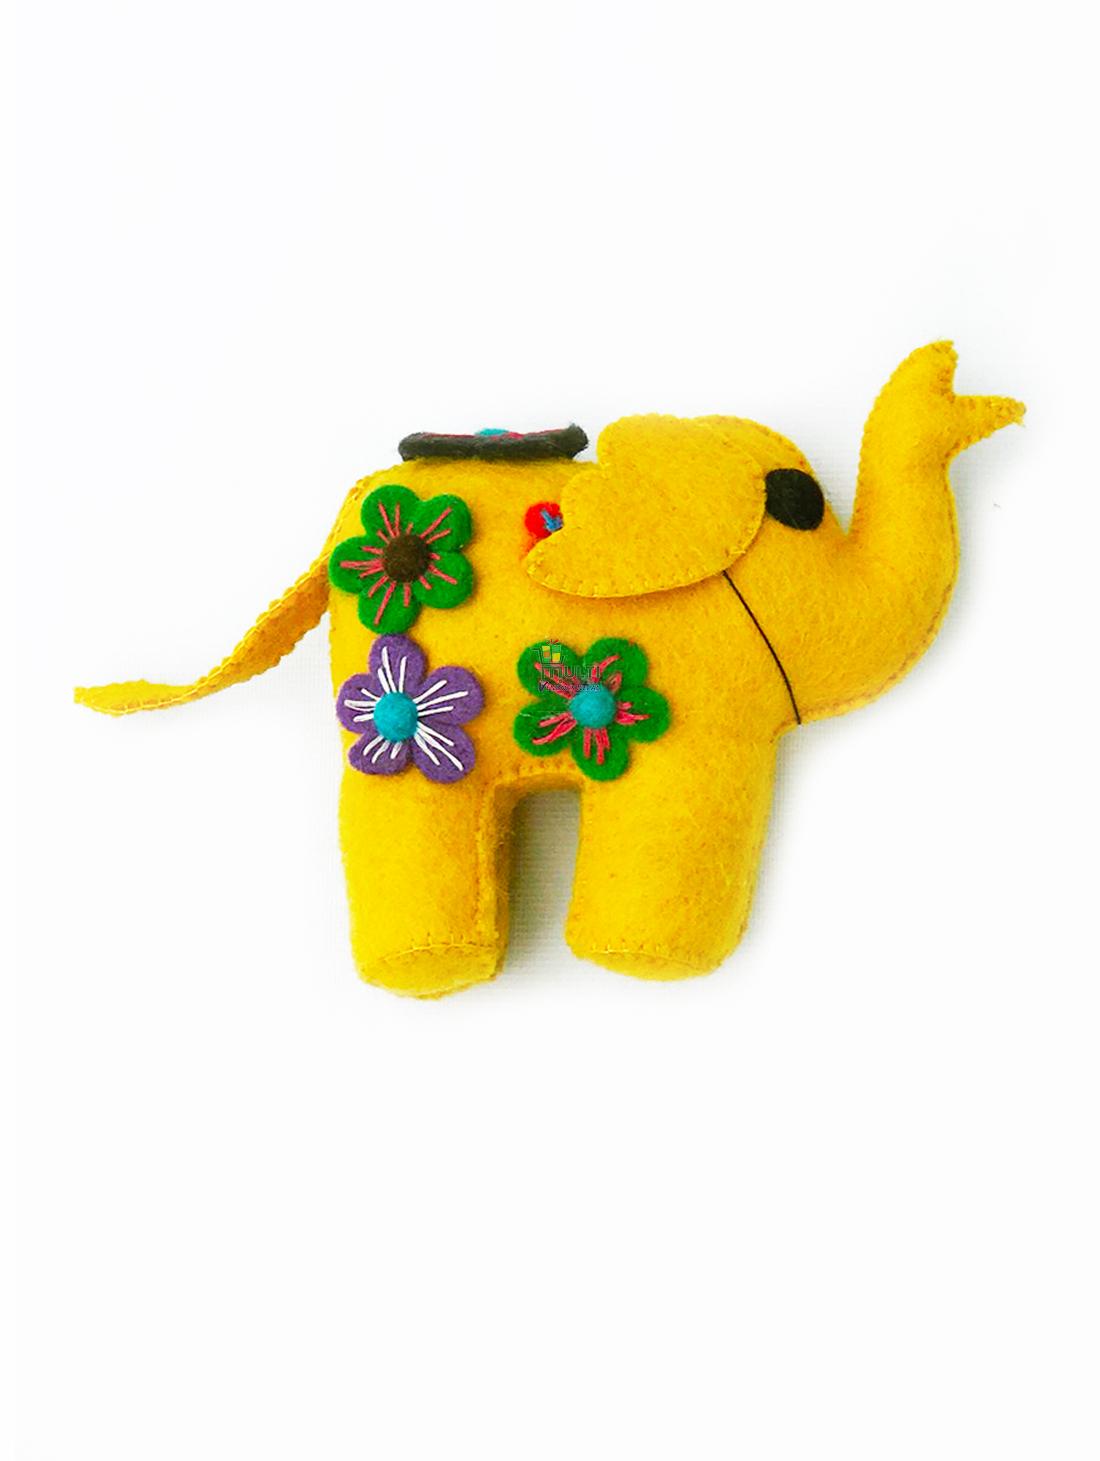 YELLOW ELEPHANT DECOR -MEDIUM- M.V.K.S.F-174